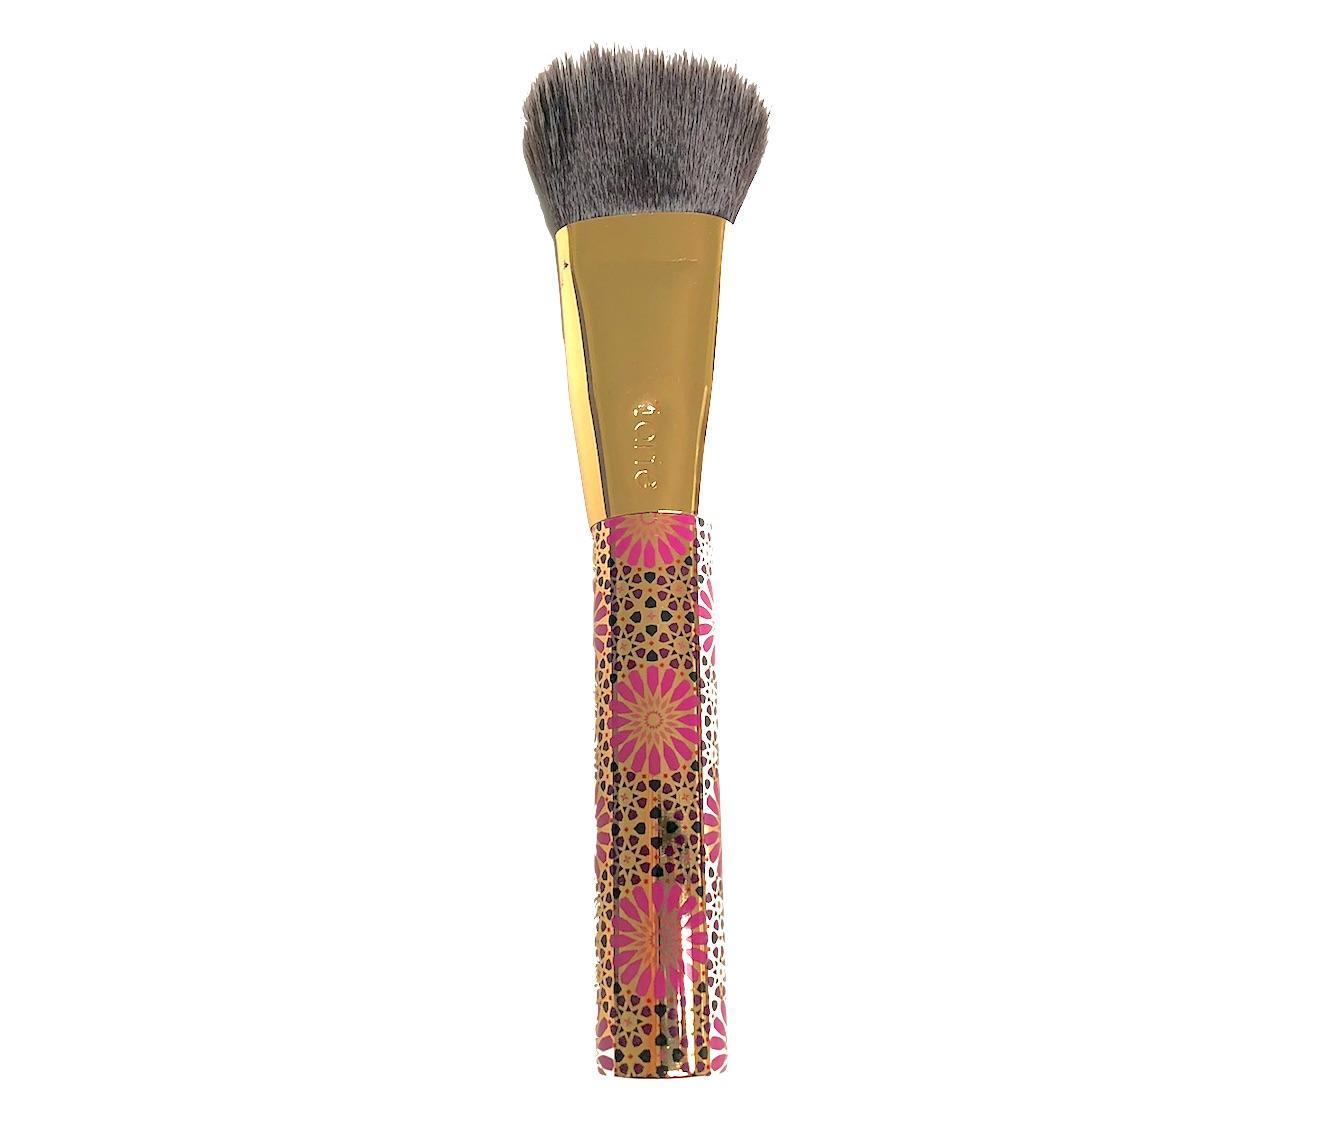 Tarte Large Face Brush Mosiac Collection